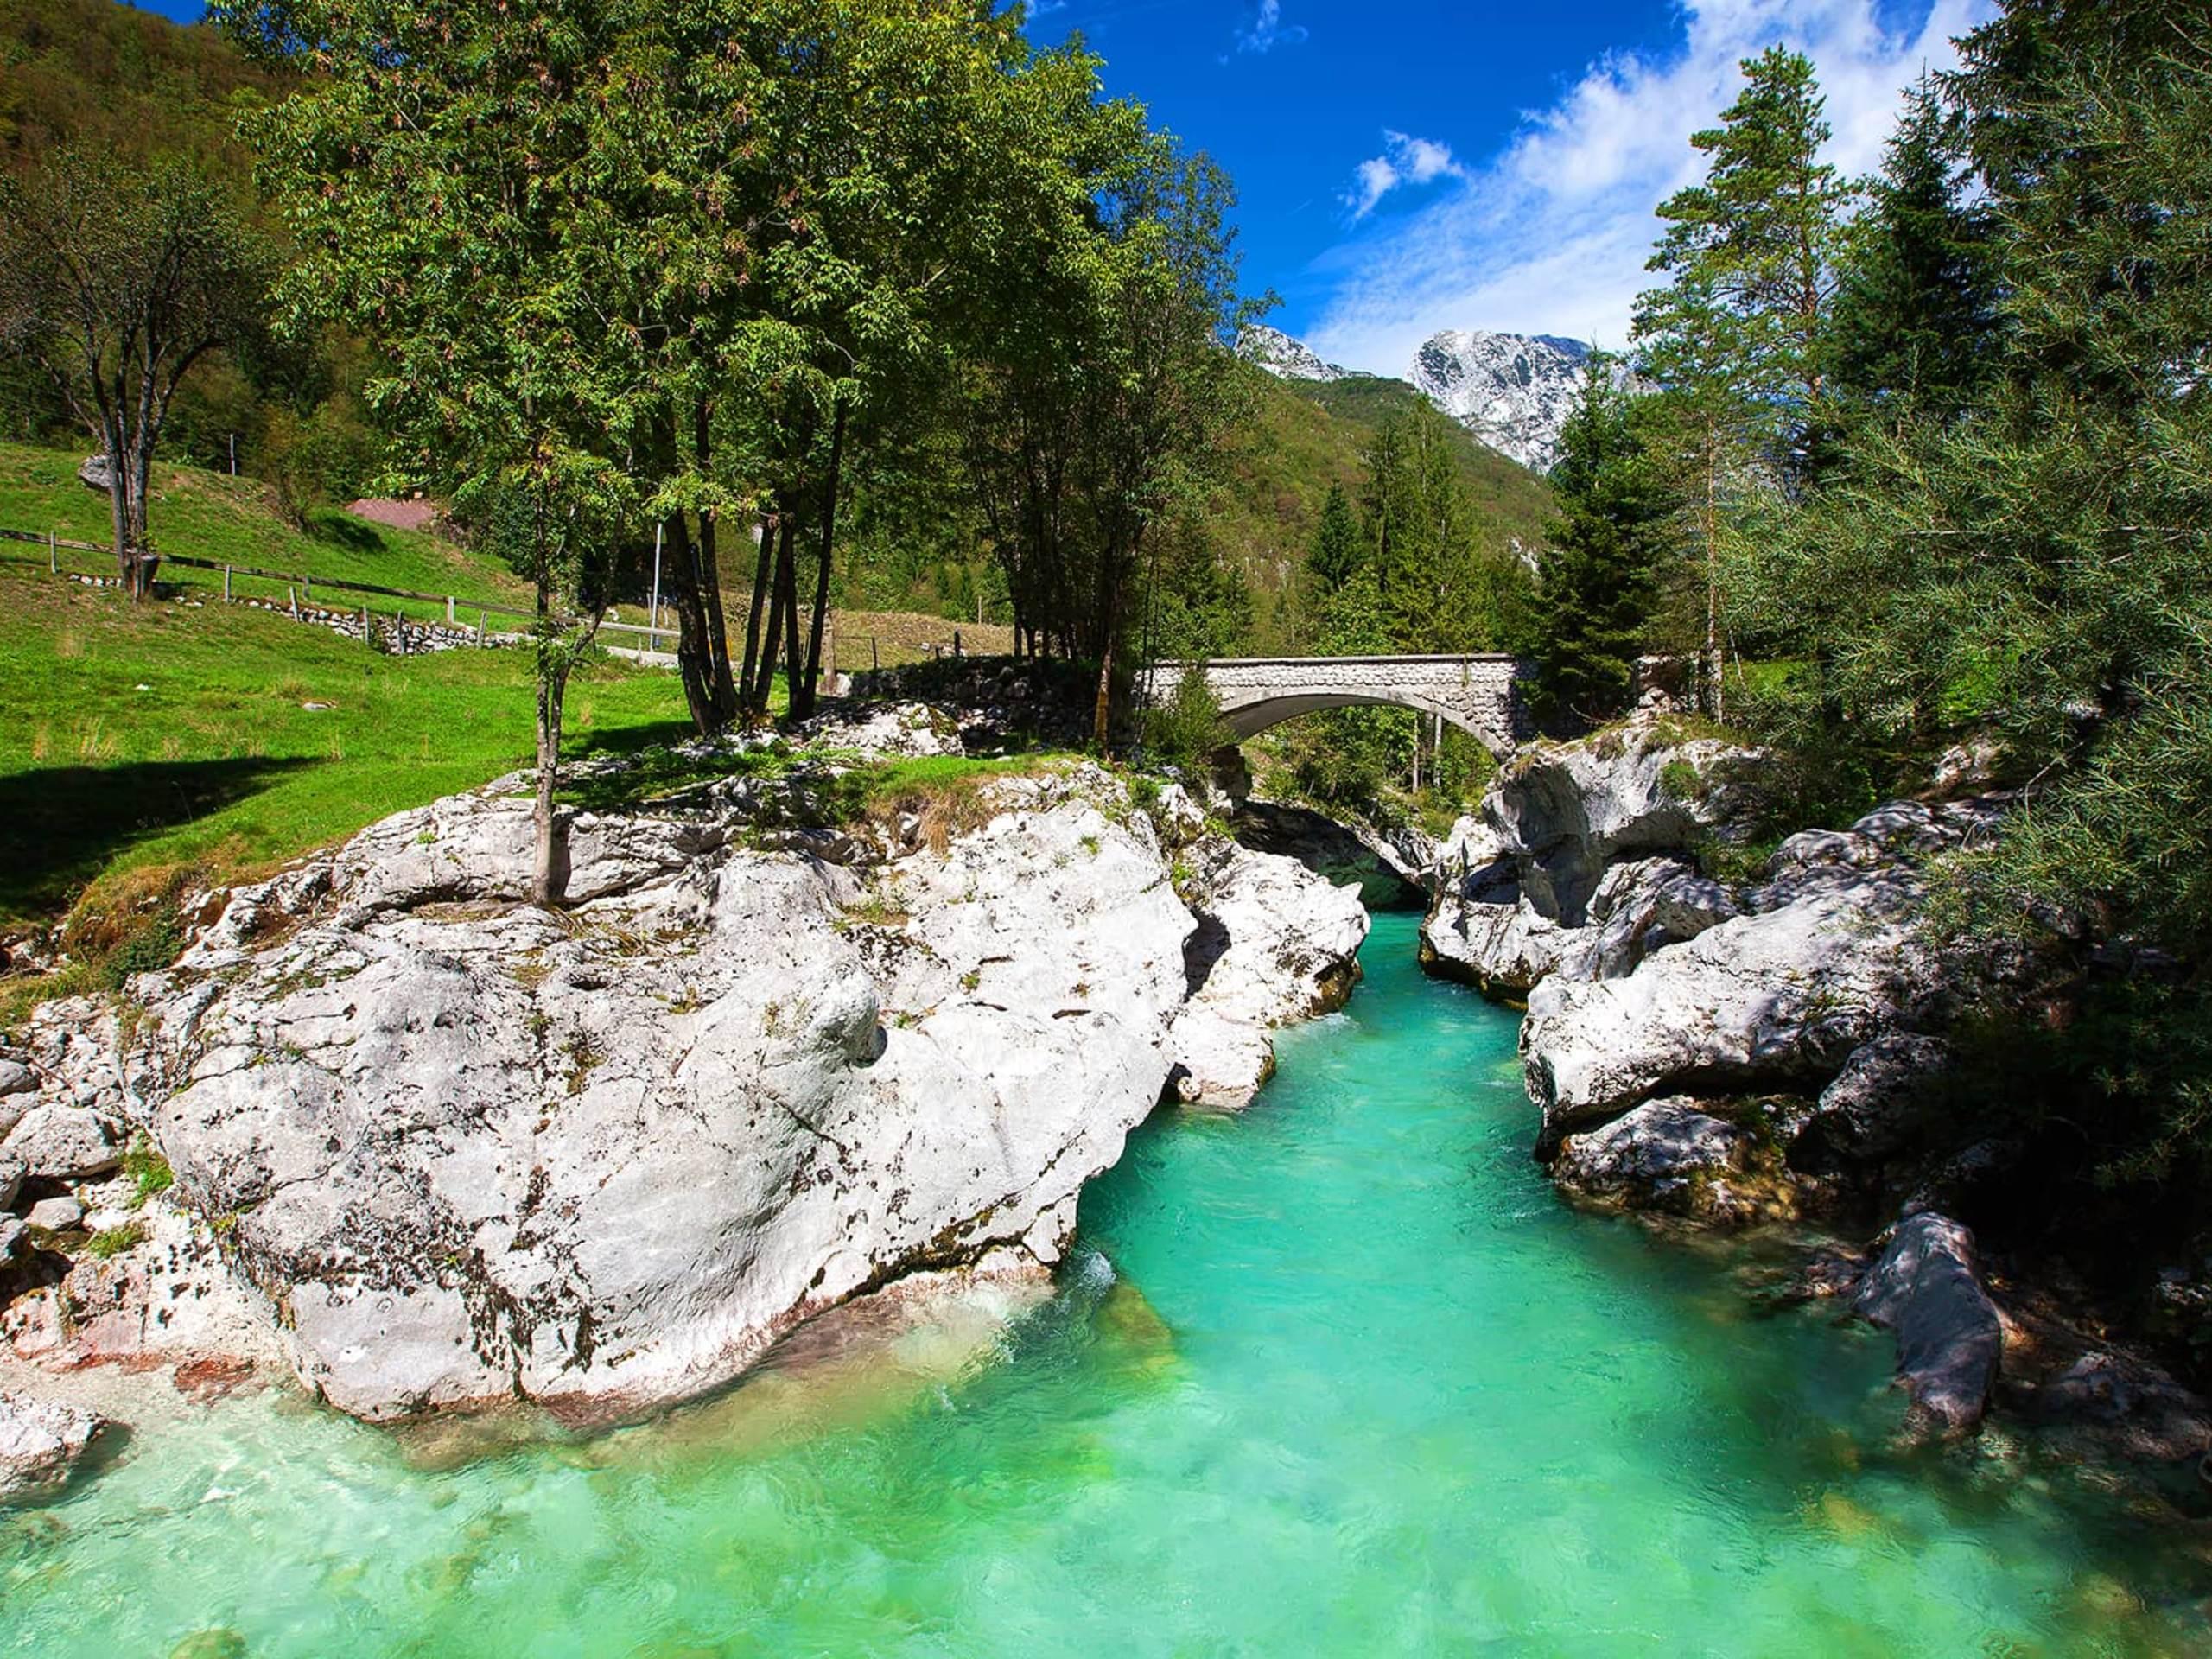 Turquoise Gorge in Slovenia